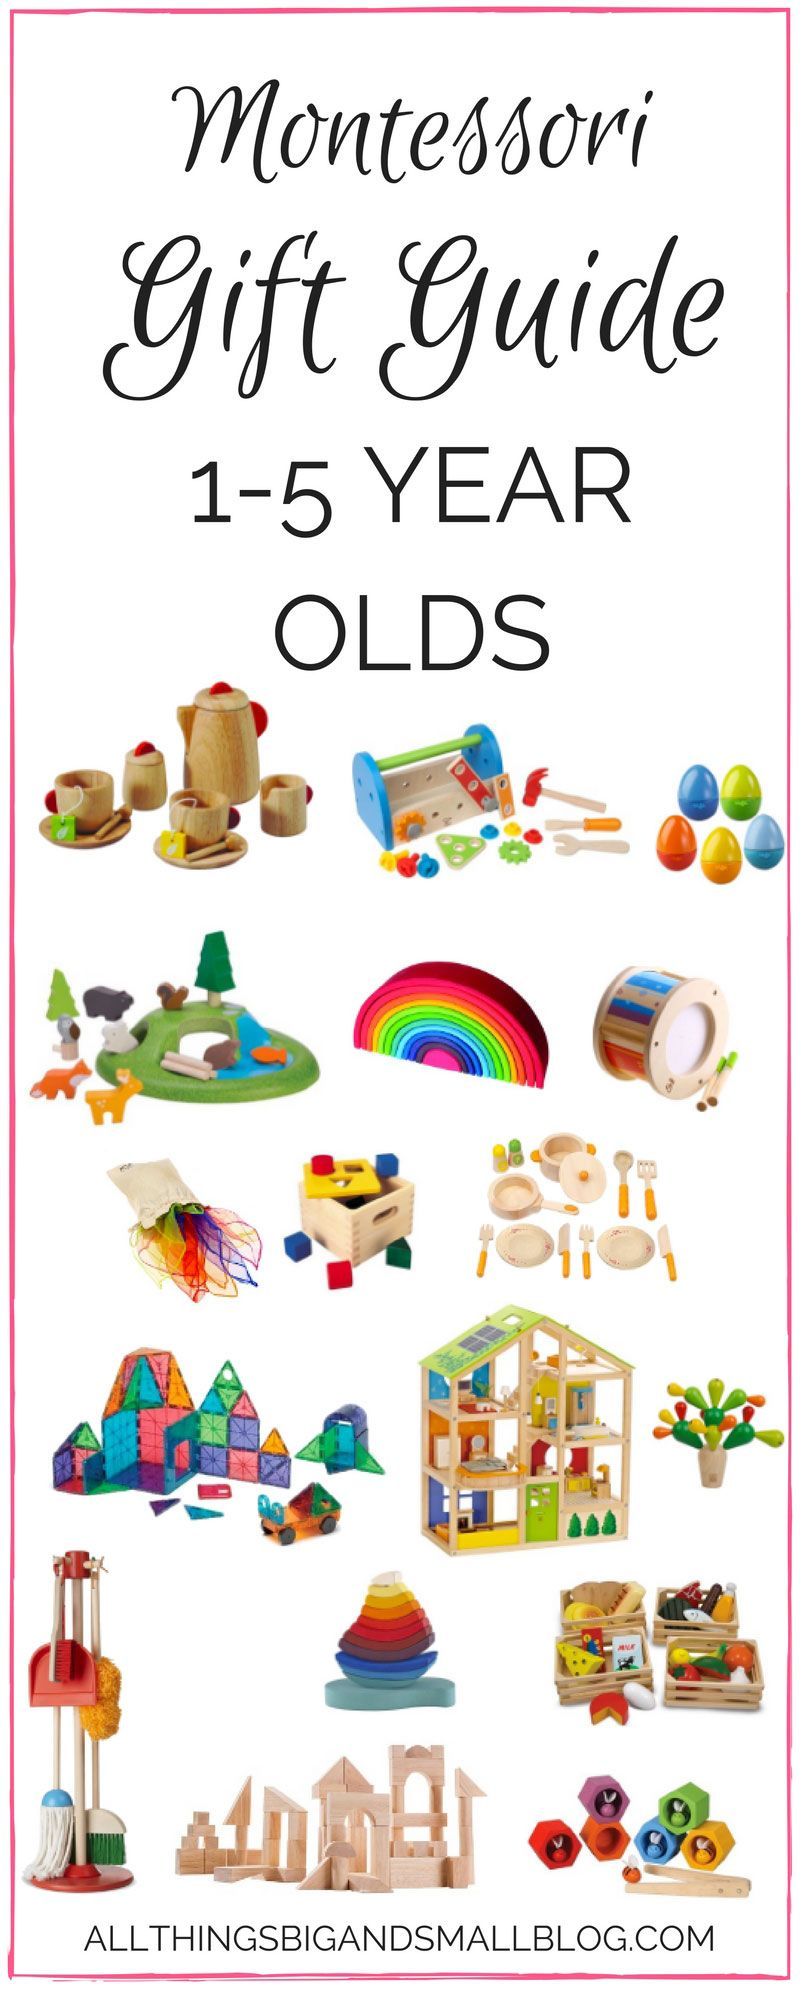 Montessori Jouets 1-5 Ans | Jouet Montessori, Montessori tout Jouet Pour Fille 4 5 Ans